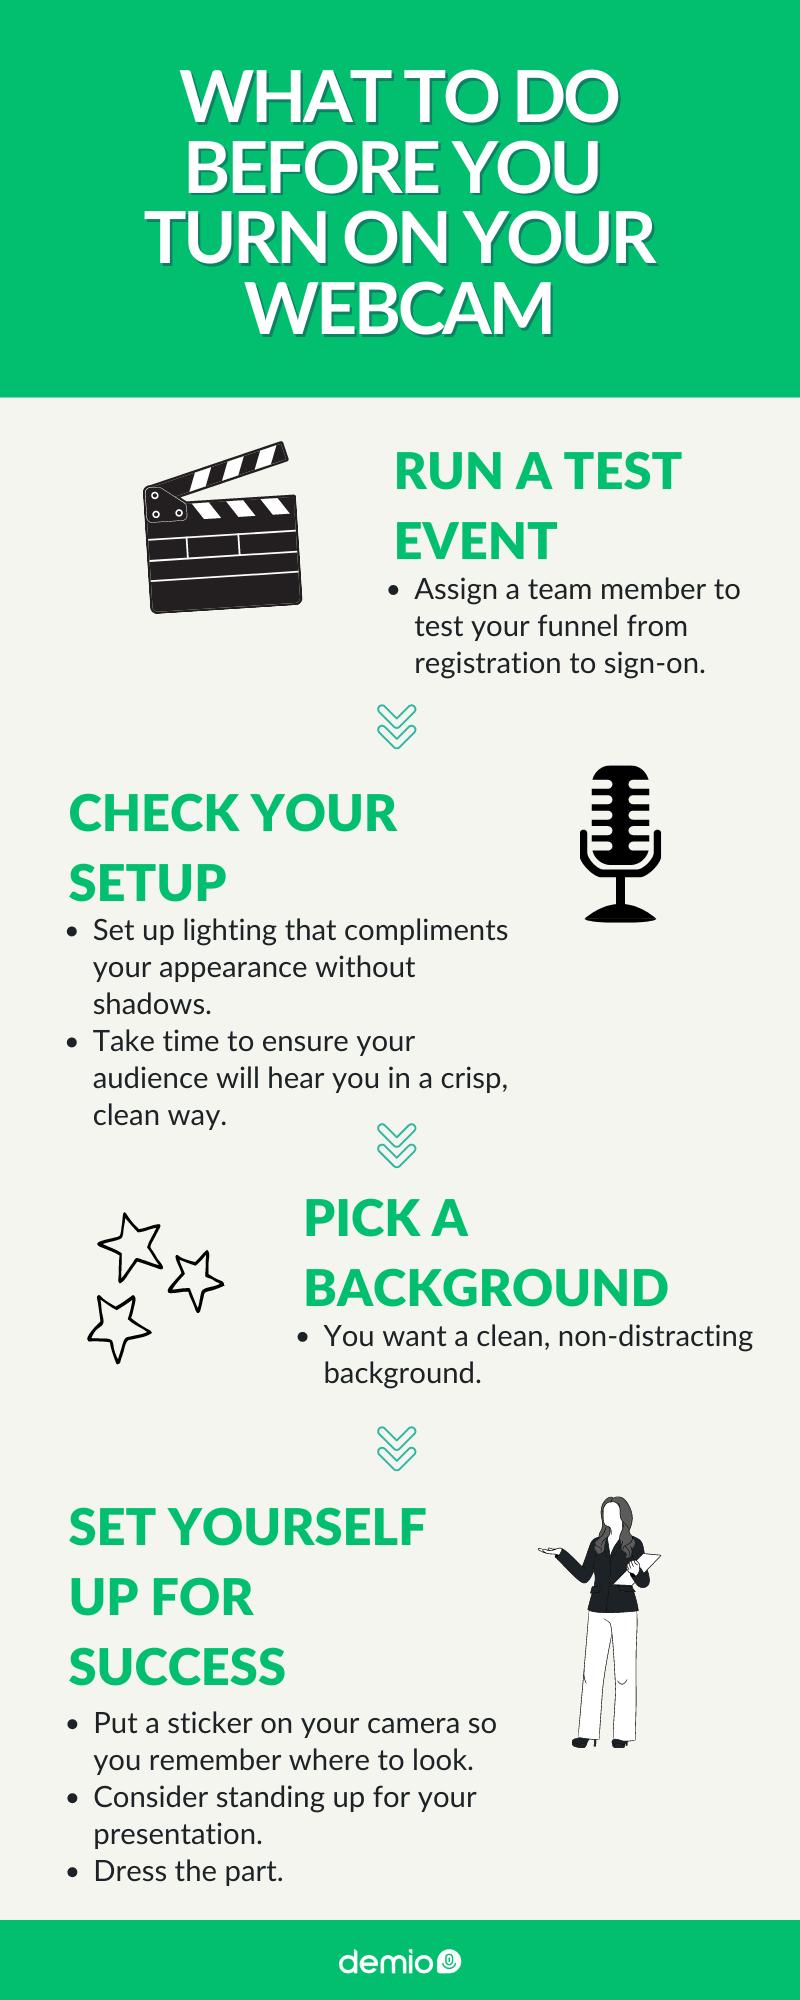 Audio and Video Pre-Check